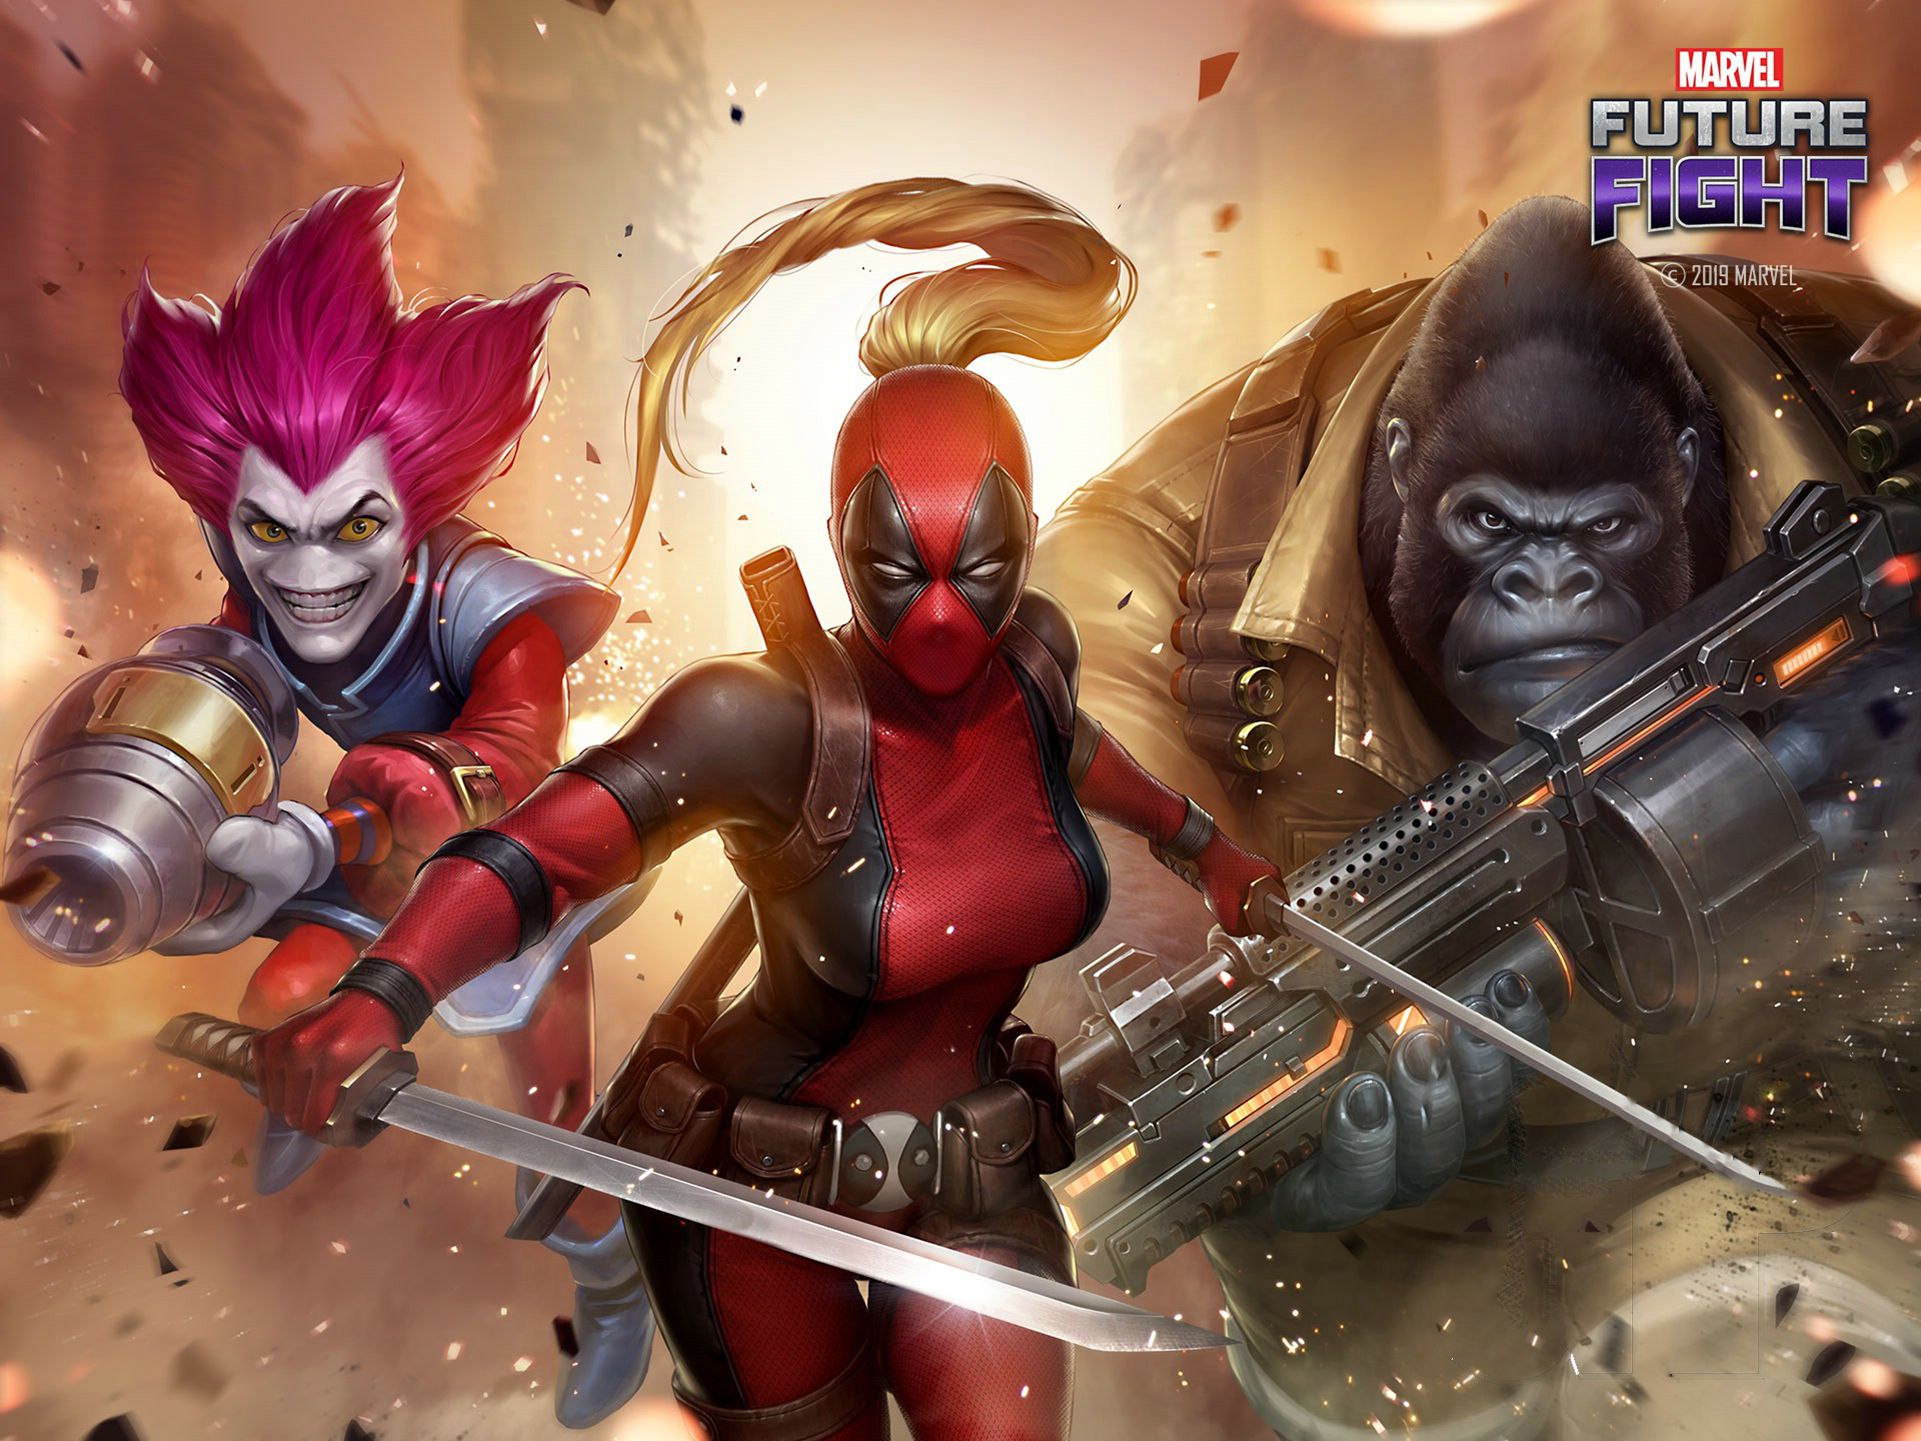 Female Deadpool Marvel Future Fight Wallpaper Hd Games 4k